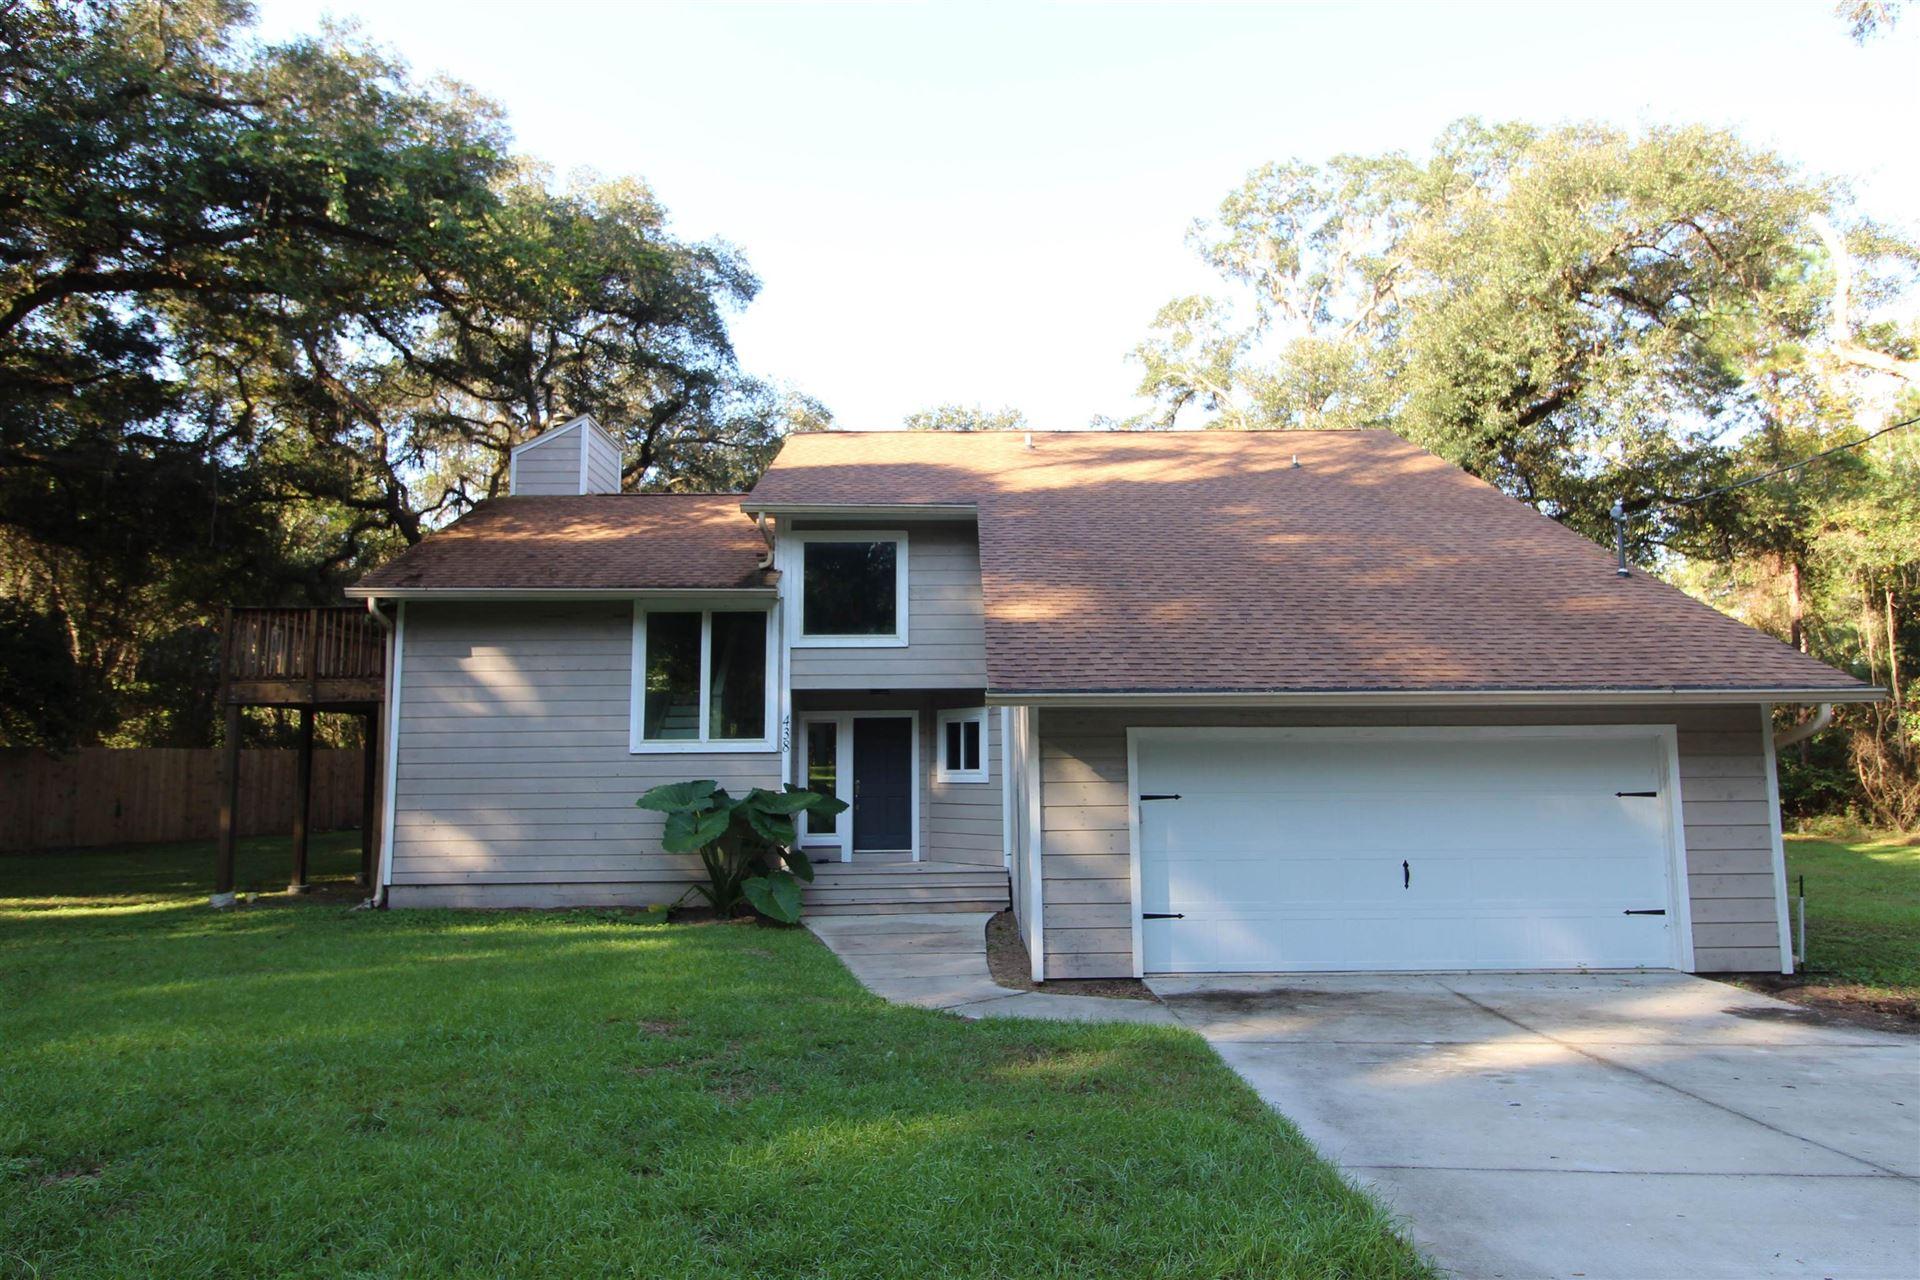 Photo of 438 Groveland Hills Drive, TALLAHASSEE, FL 32317 (MLS # 338779)